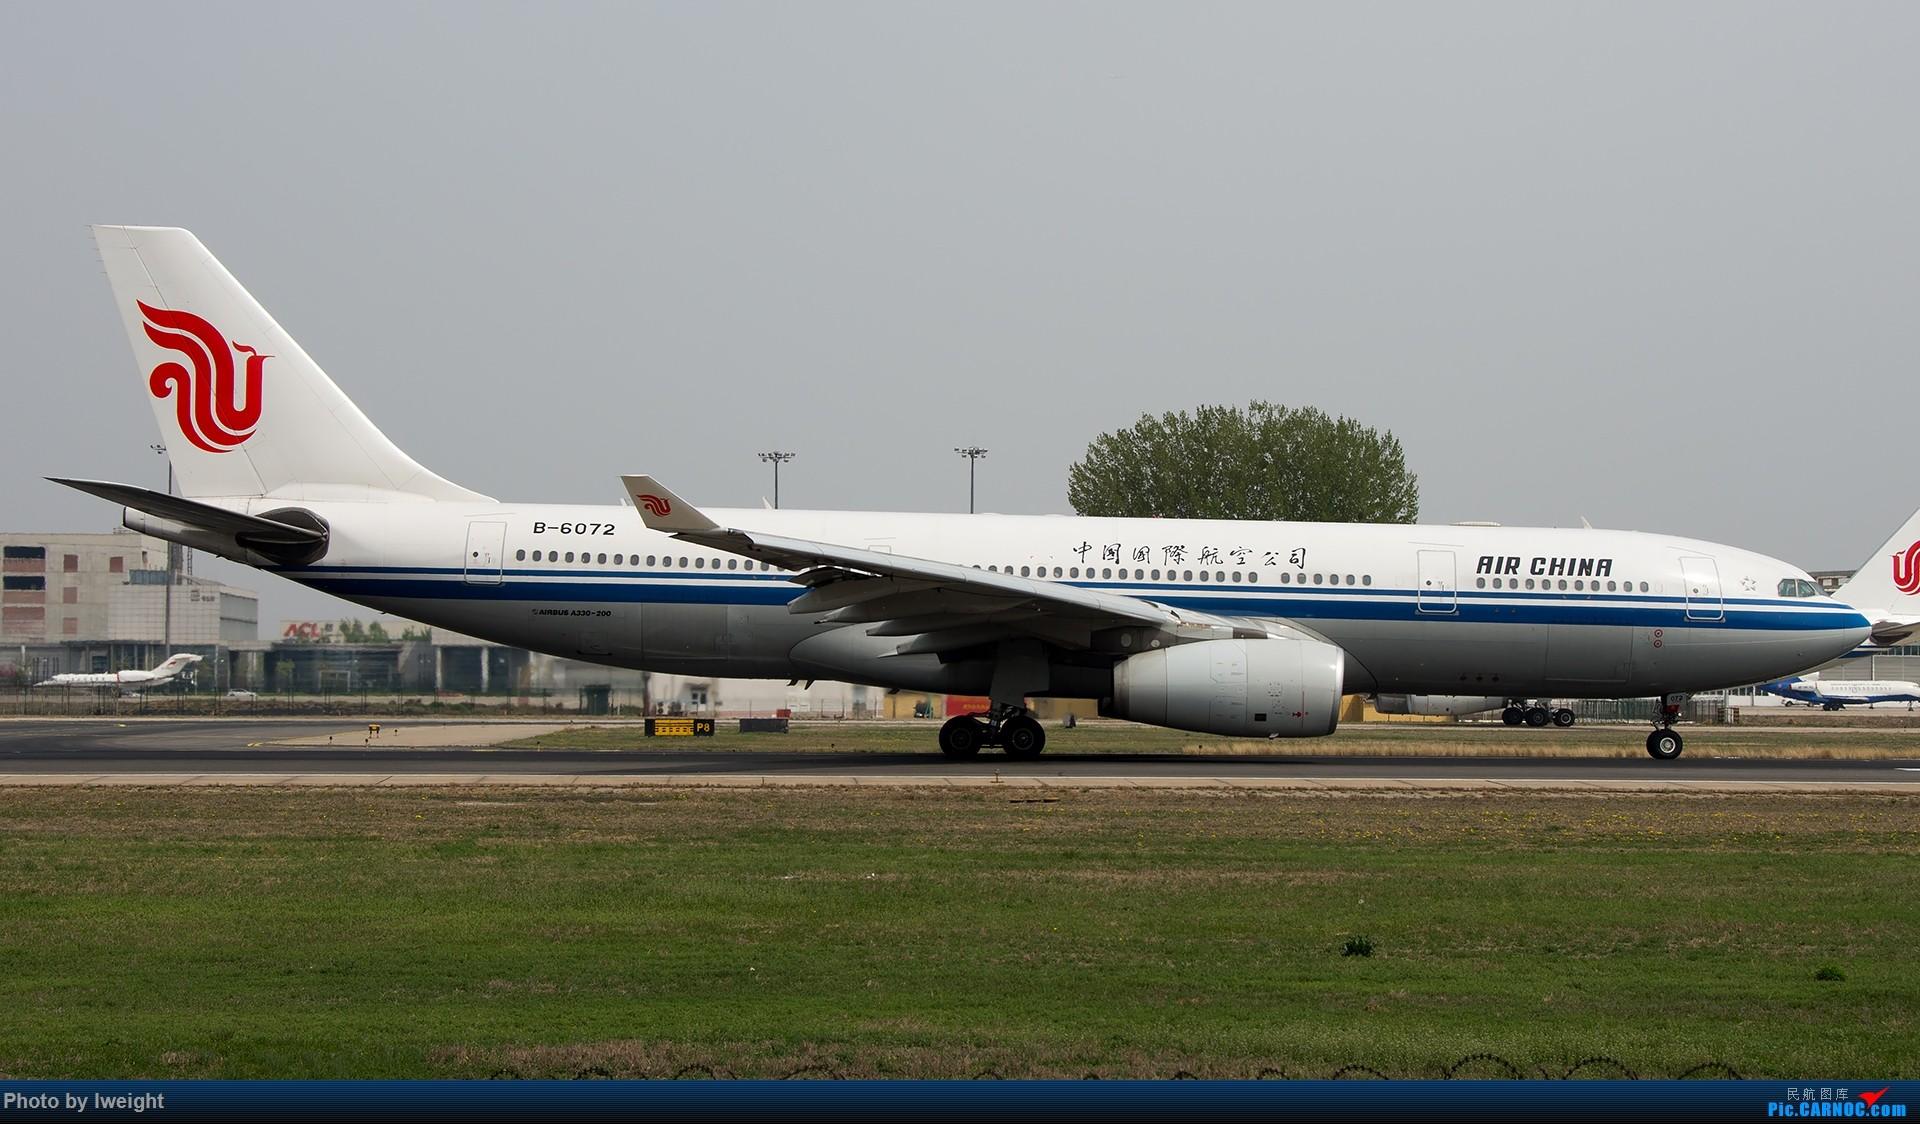 Re:[原创]霾,18R,高密度 AIRBUS A330-200 B-6072 中国北京首都国际机场